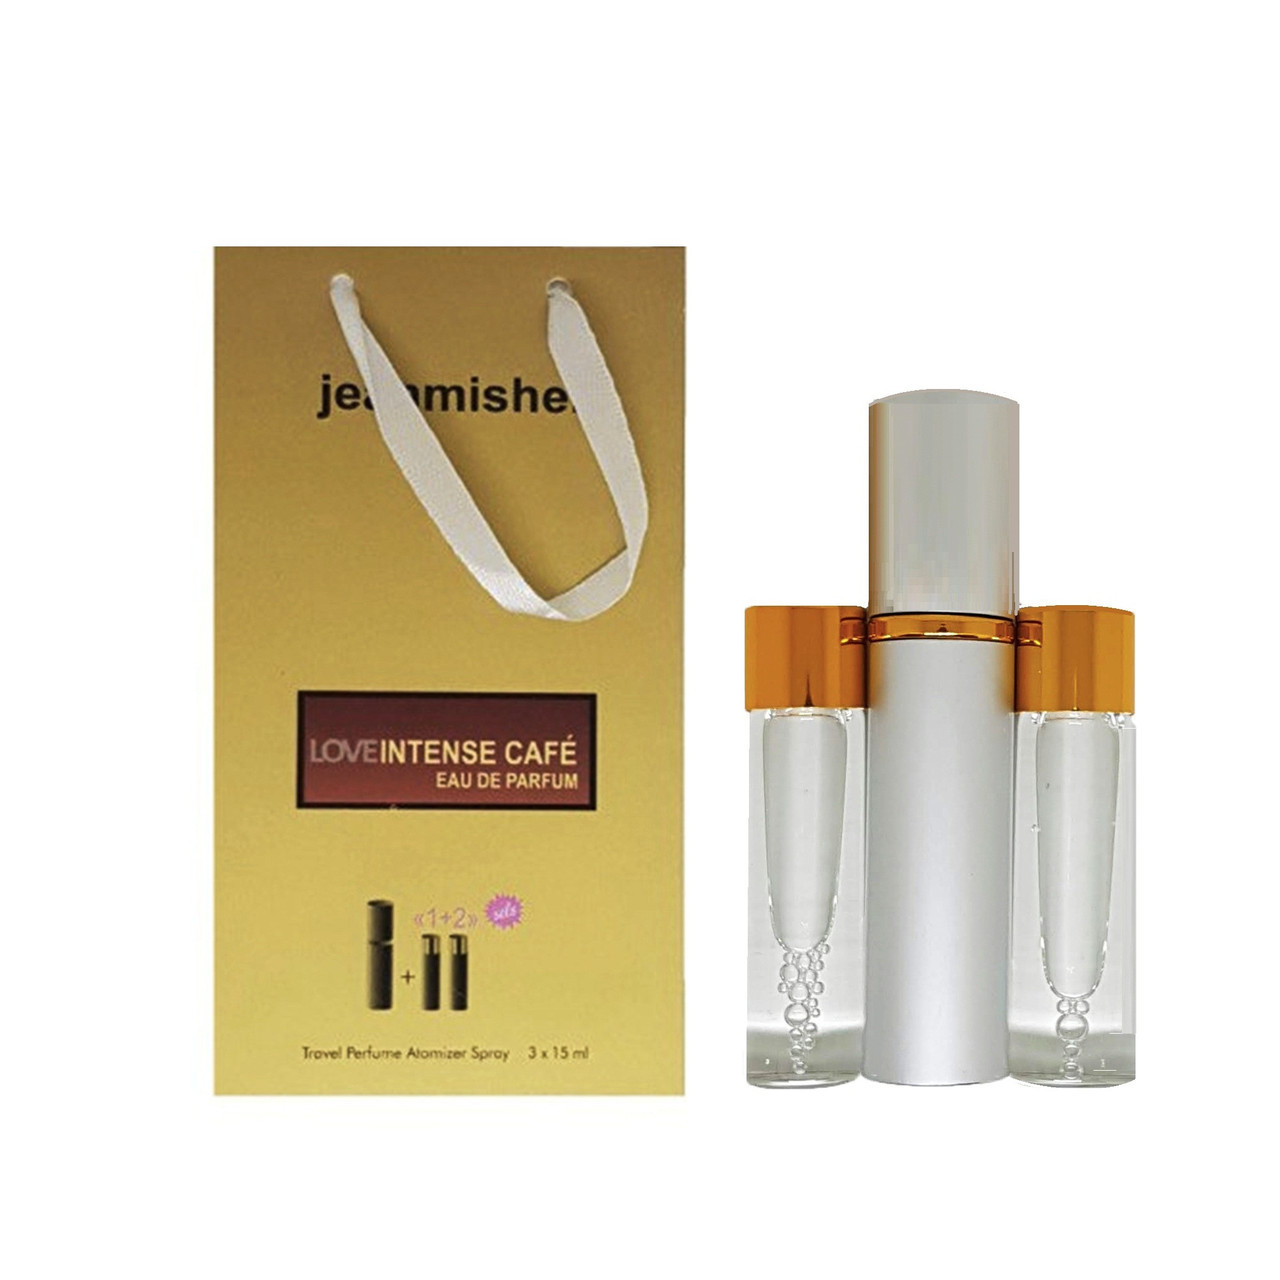 Jeanmishel Love Intense Cafe (93) 3 x 15 ml